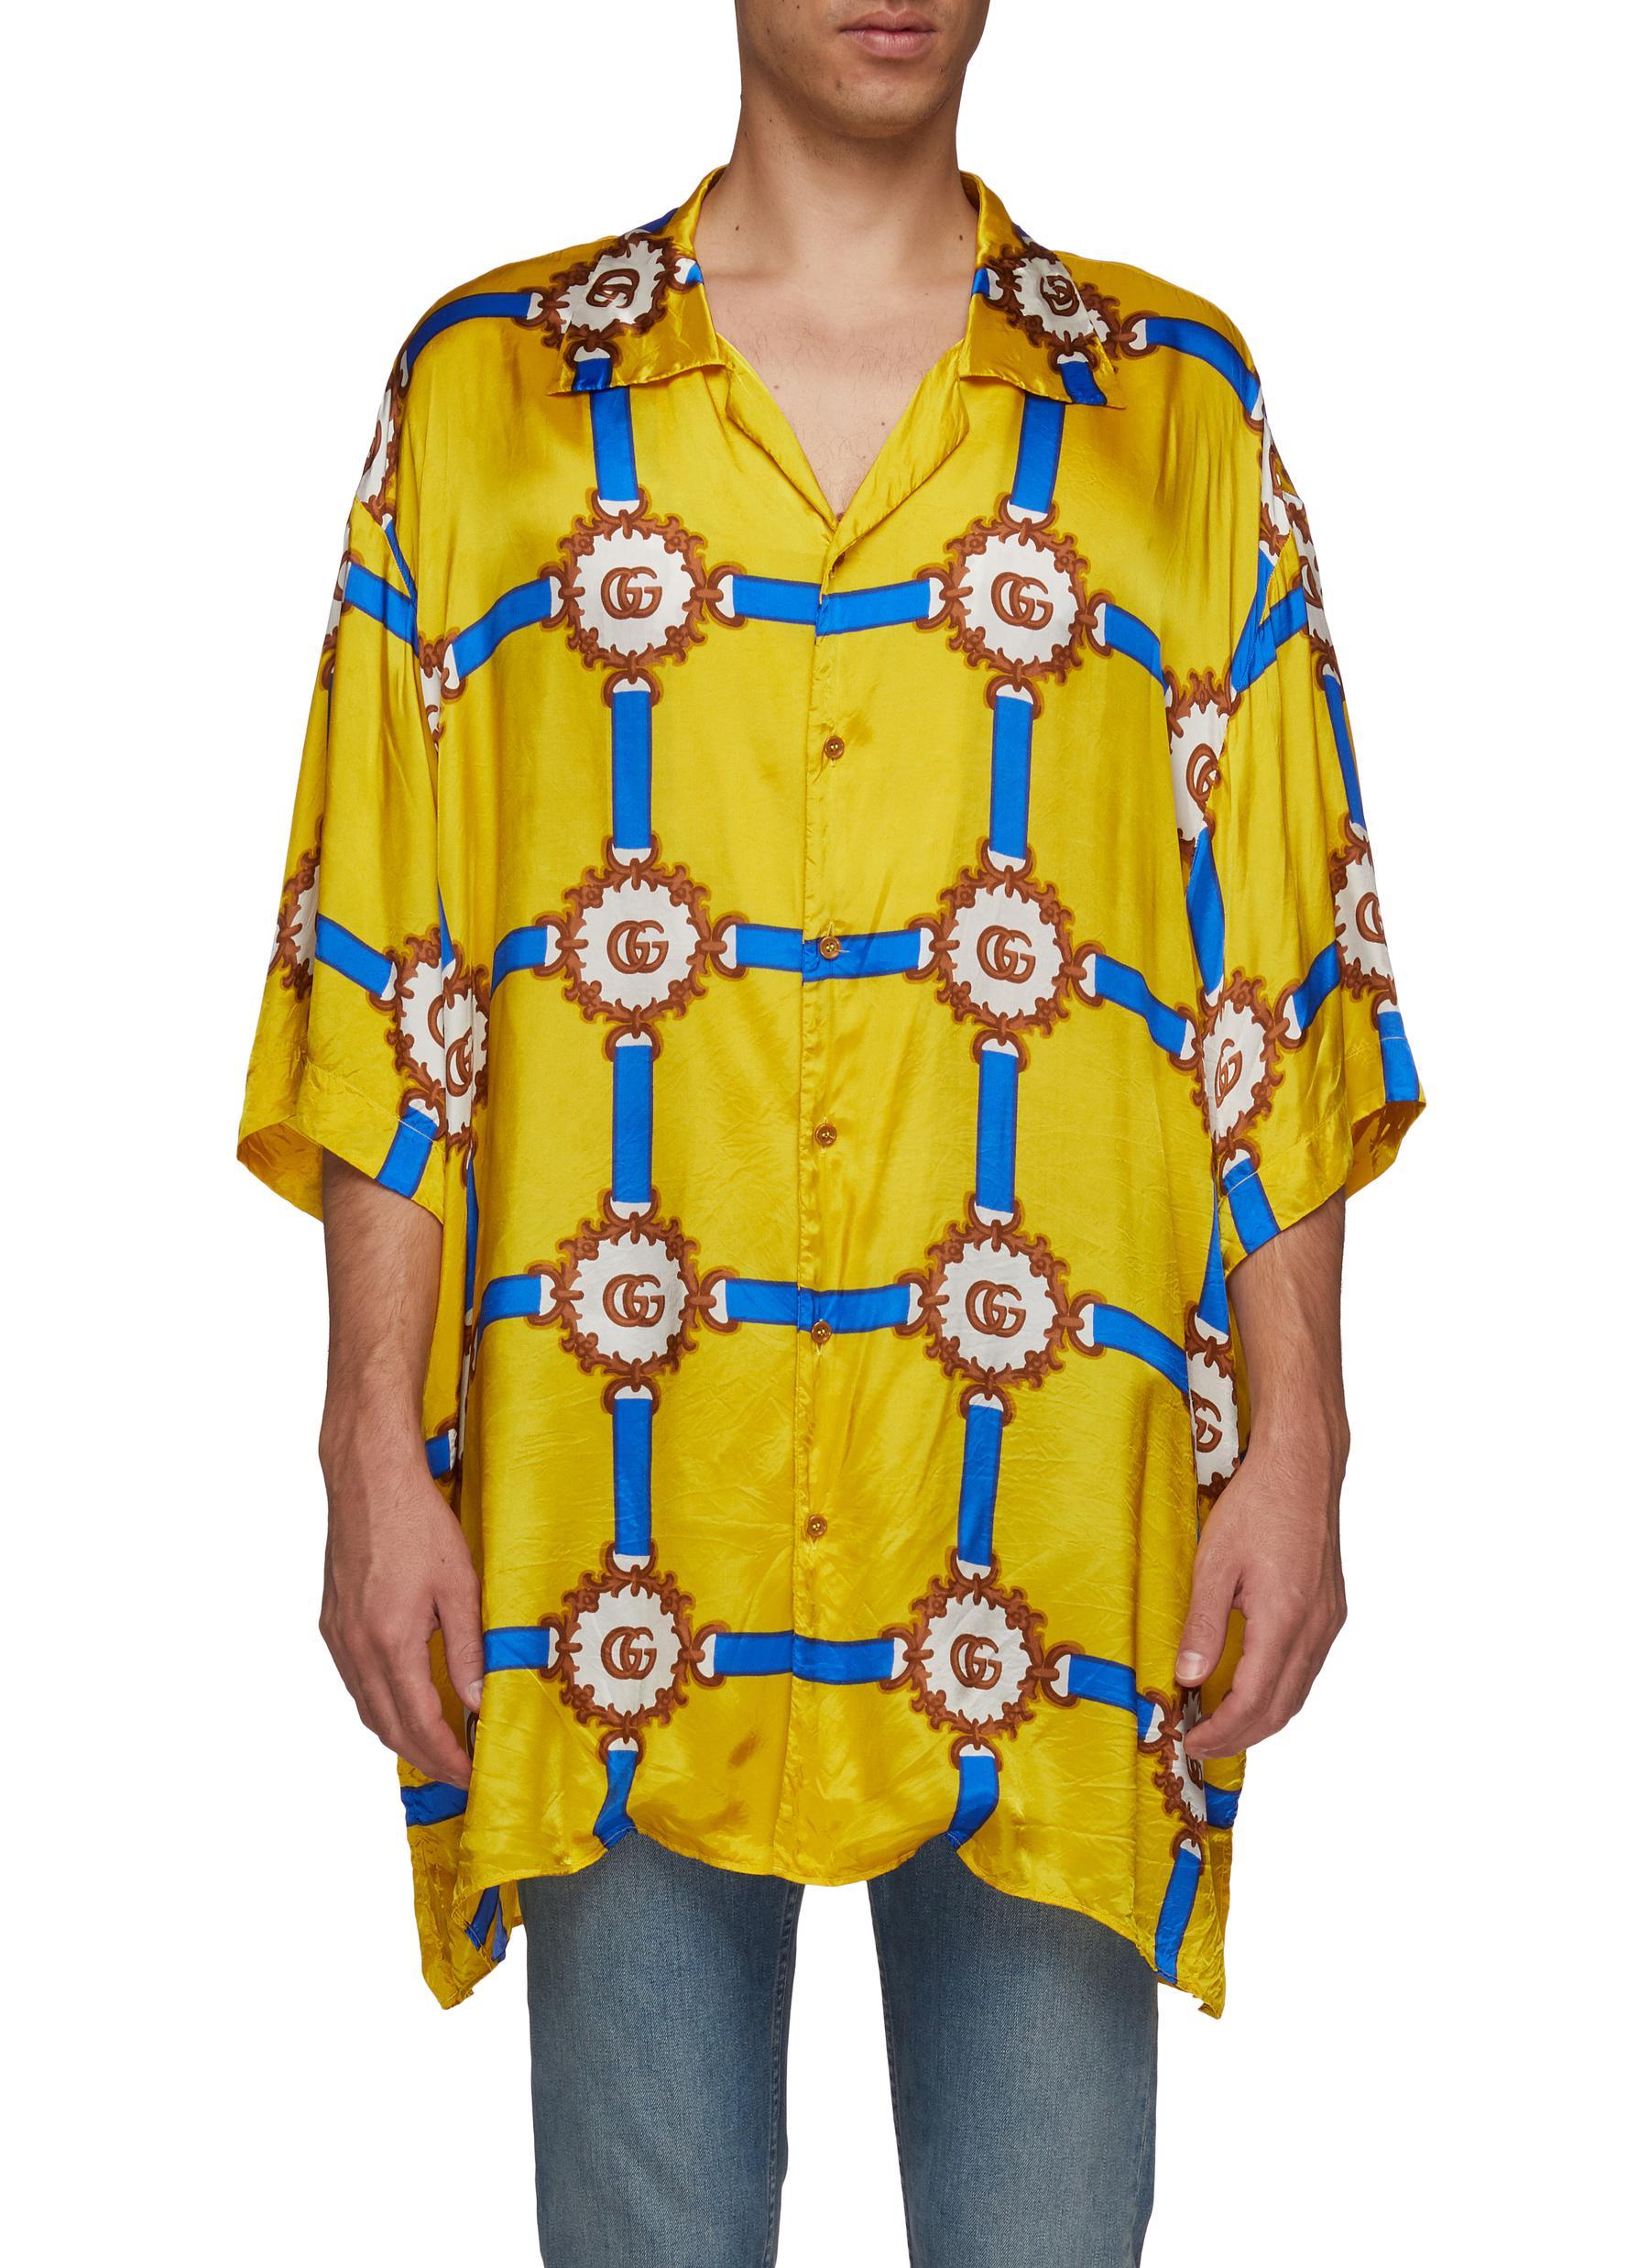 e1865dd1da4b GUCCI | GG logo harness print oversized bowling shirt | Men | Lane ...